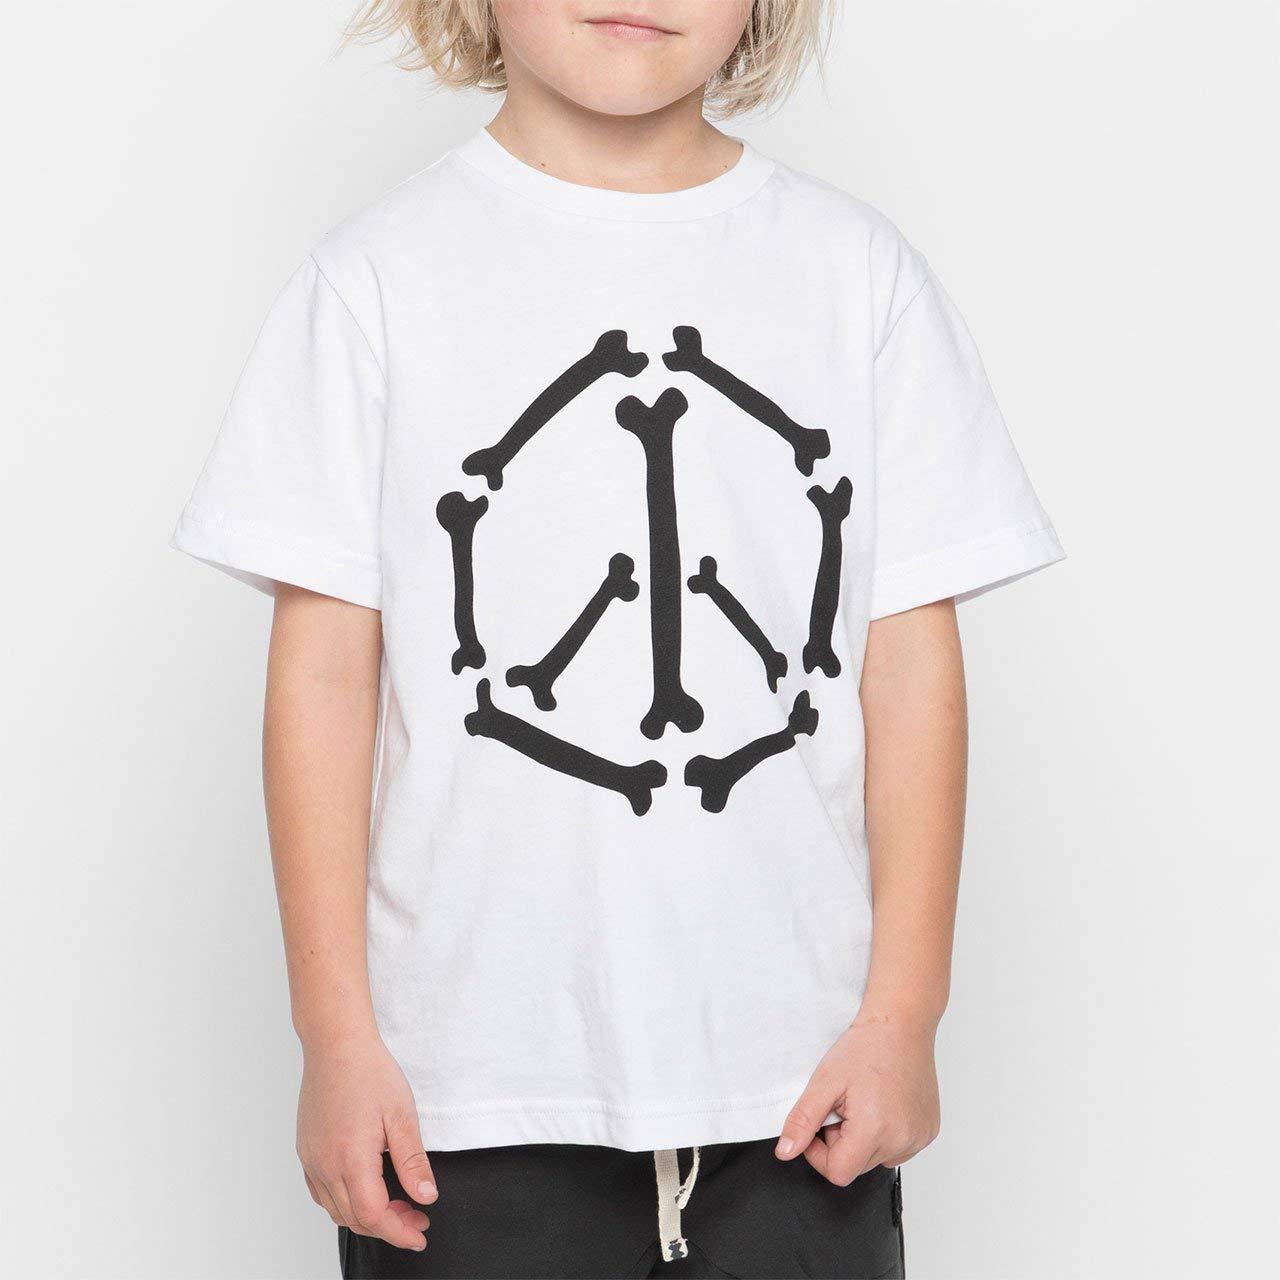 Youth Boys Peace Bones Tee White Size 14 Munster Kids Munster